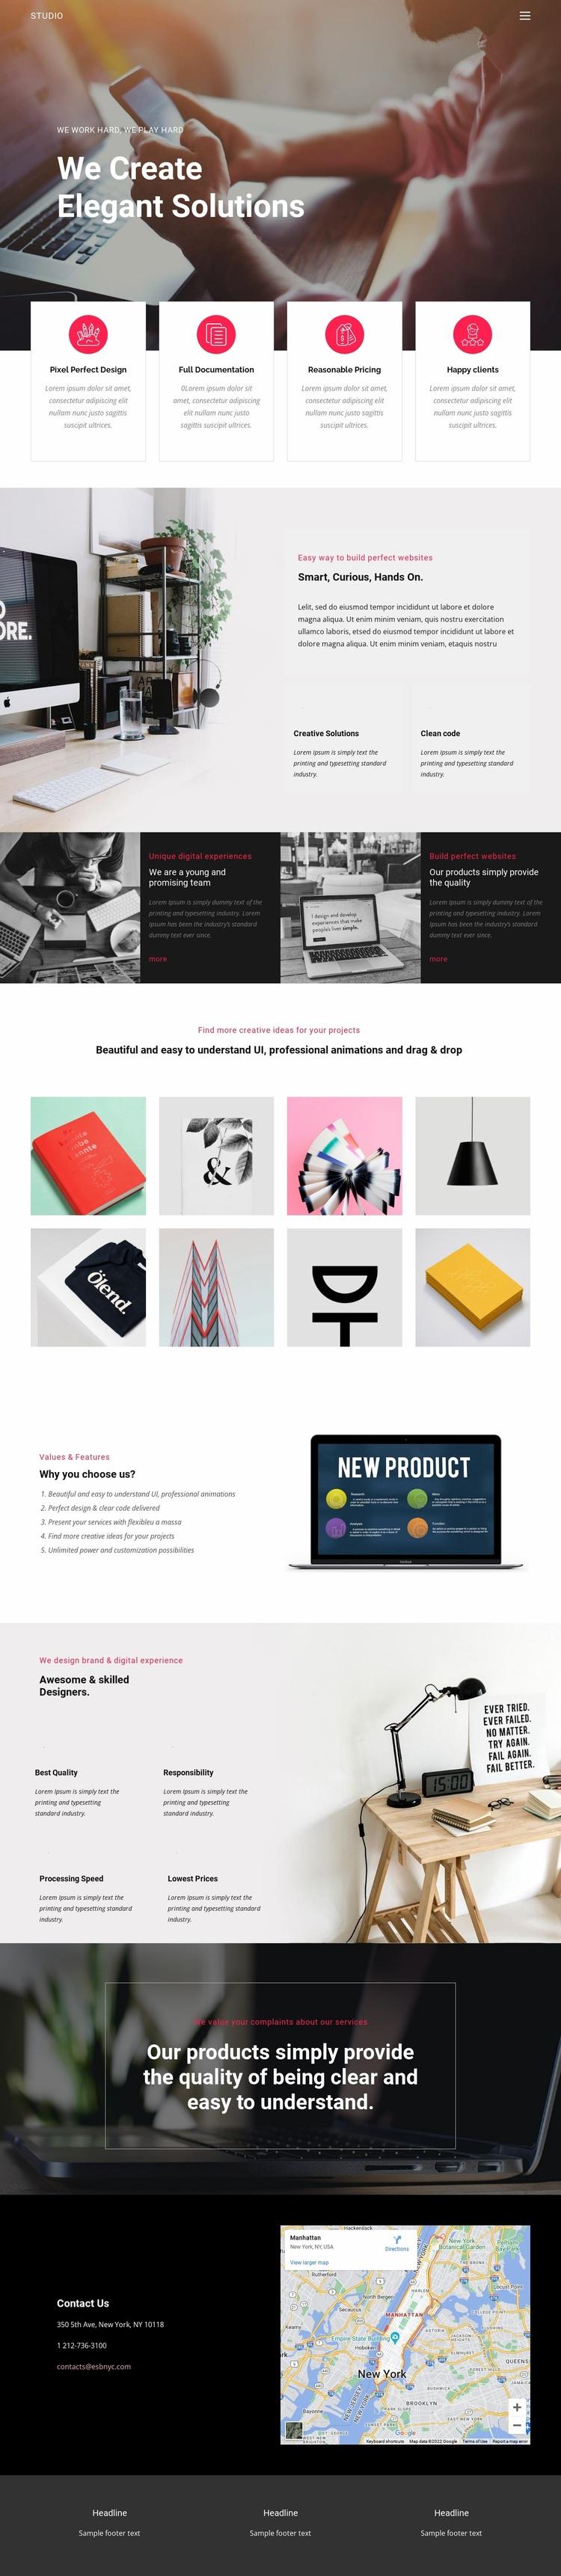 Elegant solutions in business  Website Design